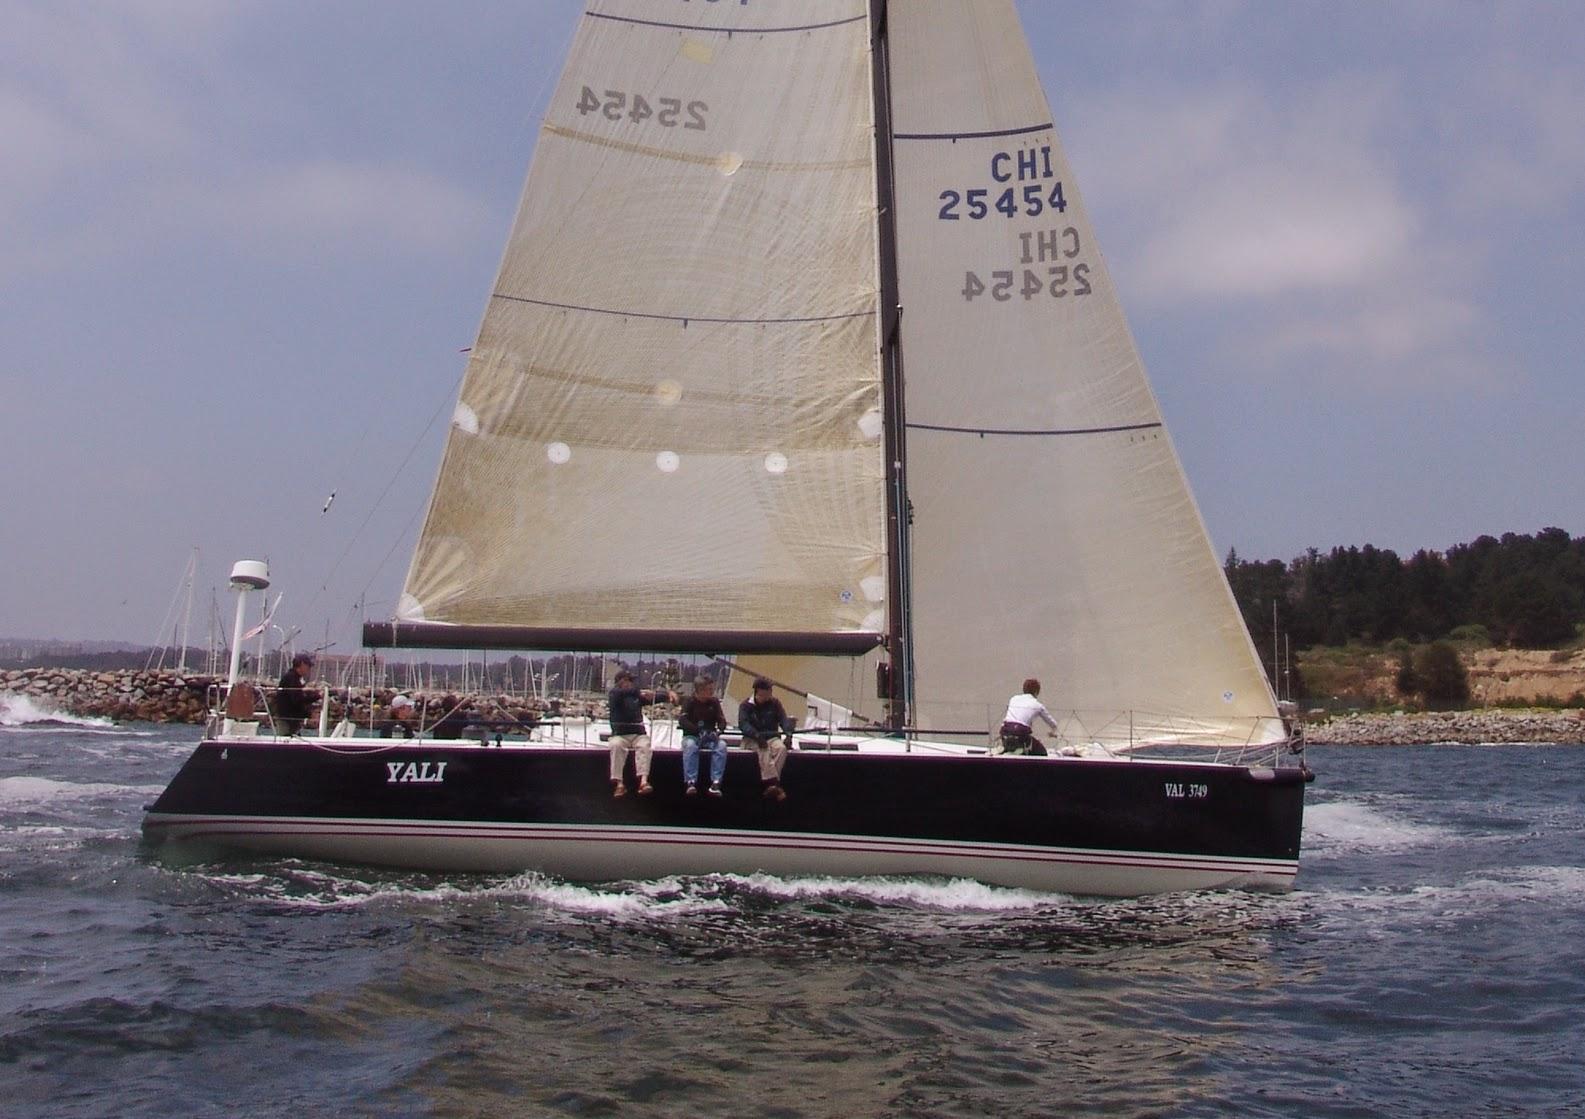 J/145 sailing off Algarrobo, Chile